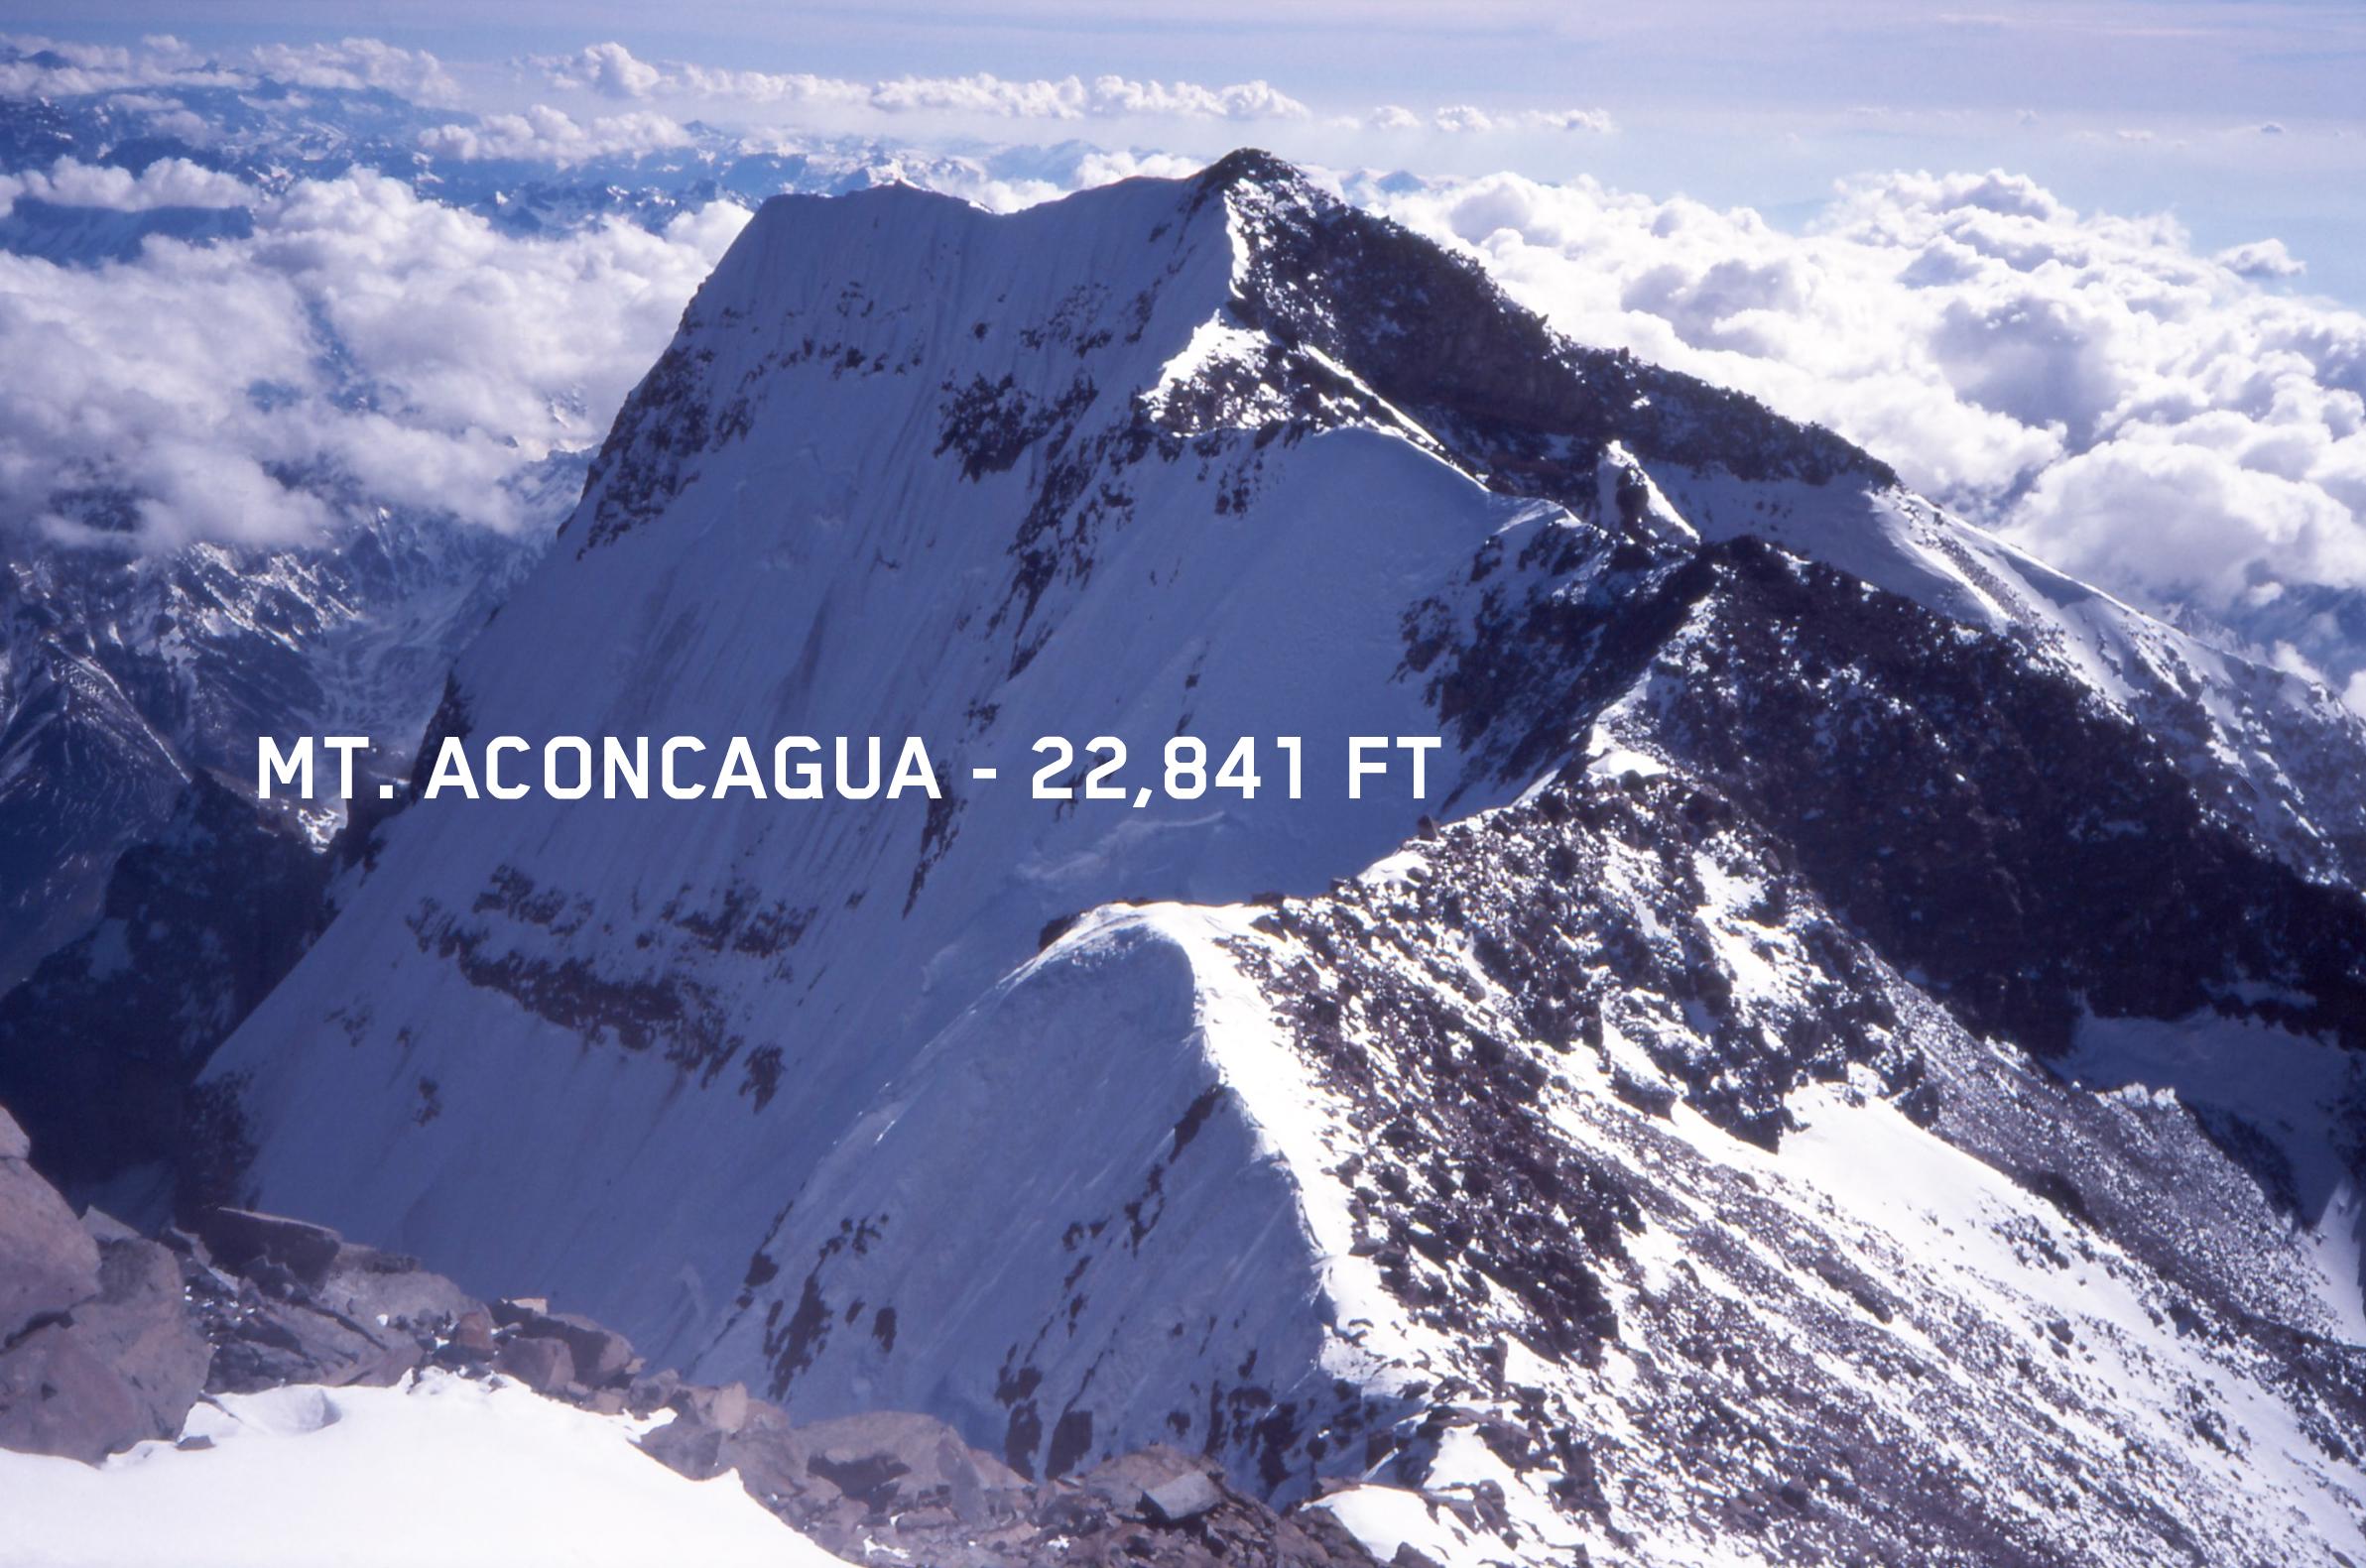 5 Inspiring Mountains You NEED to Climb!